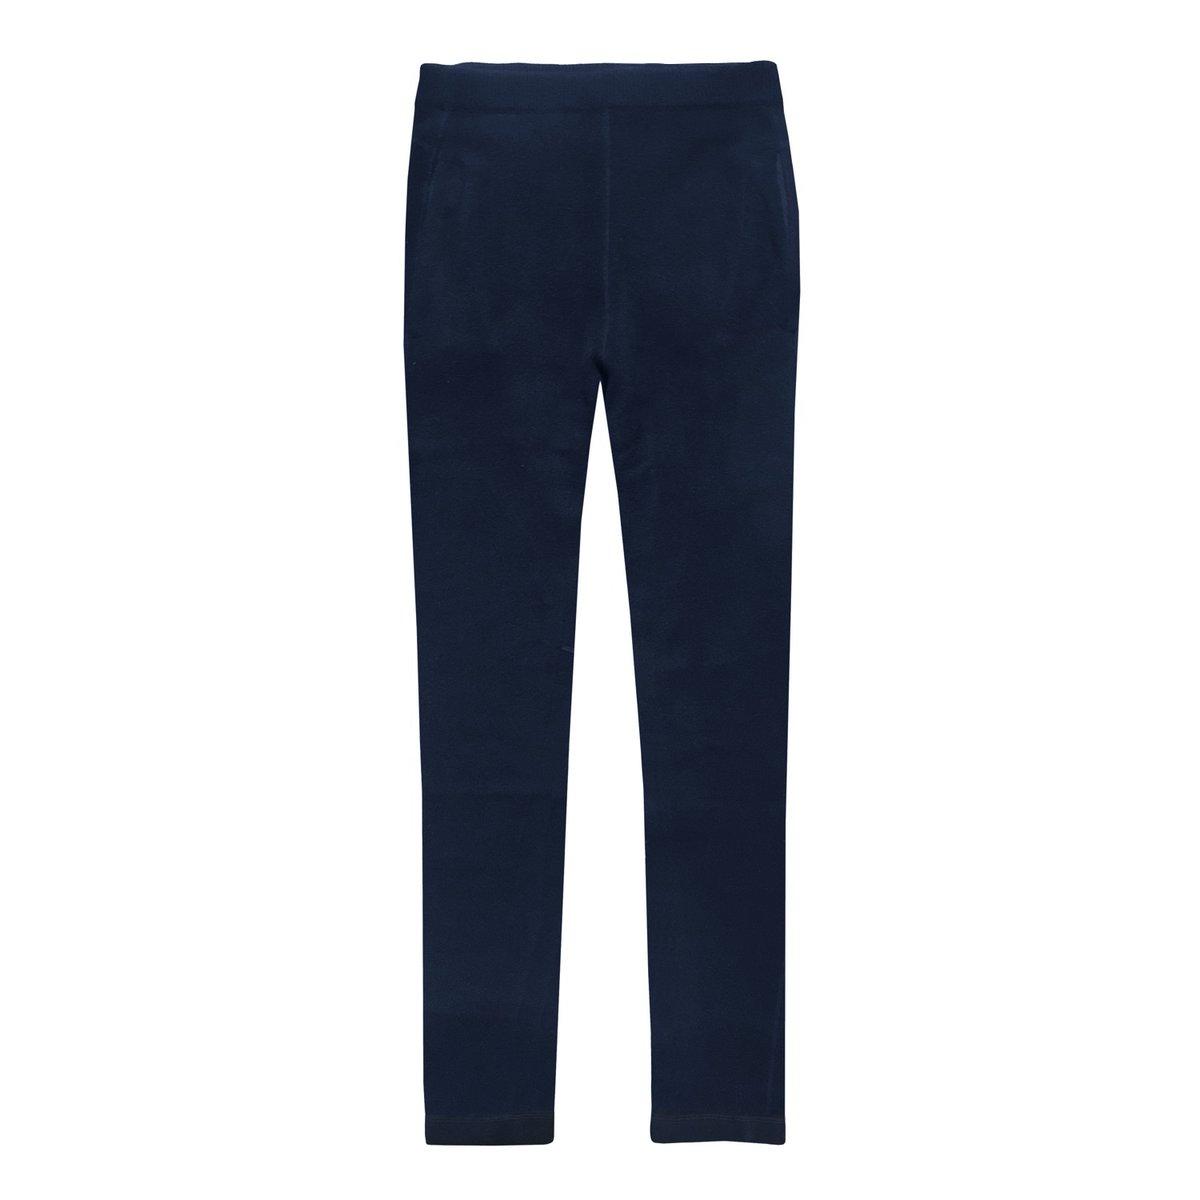 gray wool knit pants.jpg